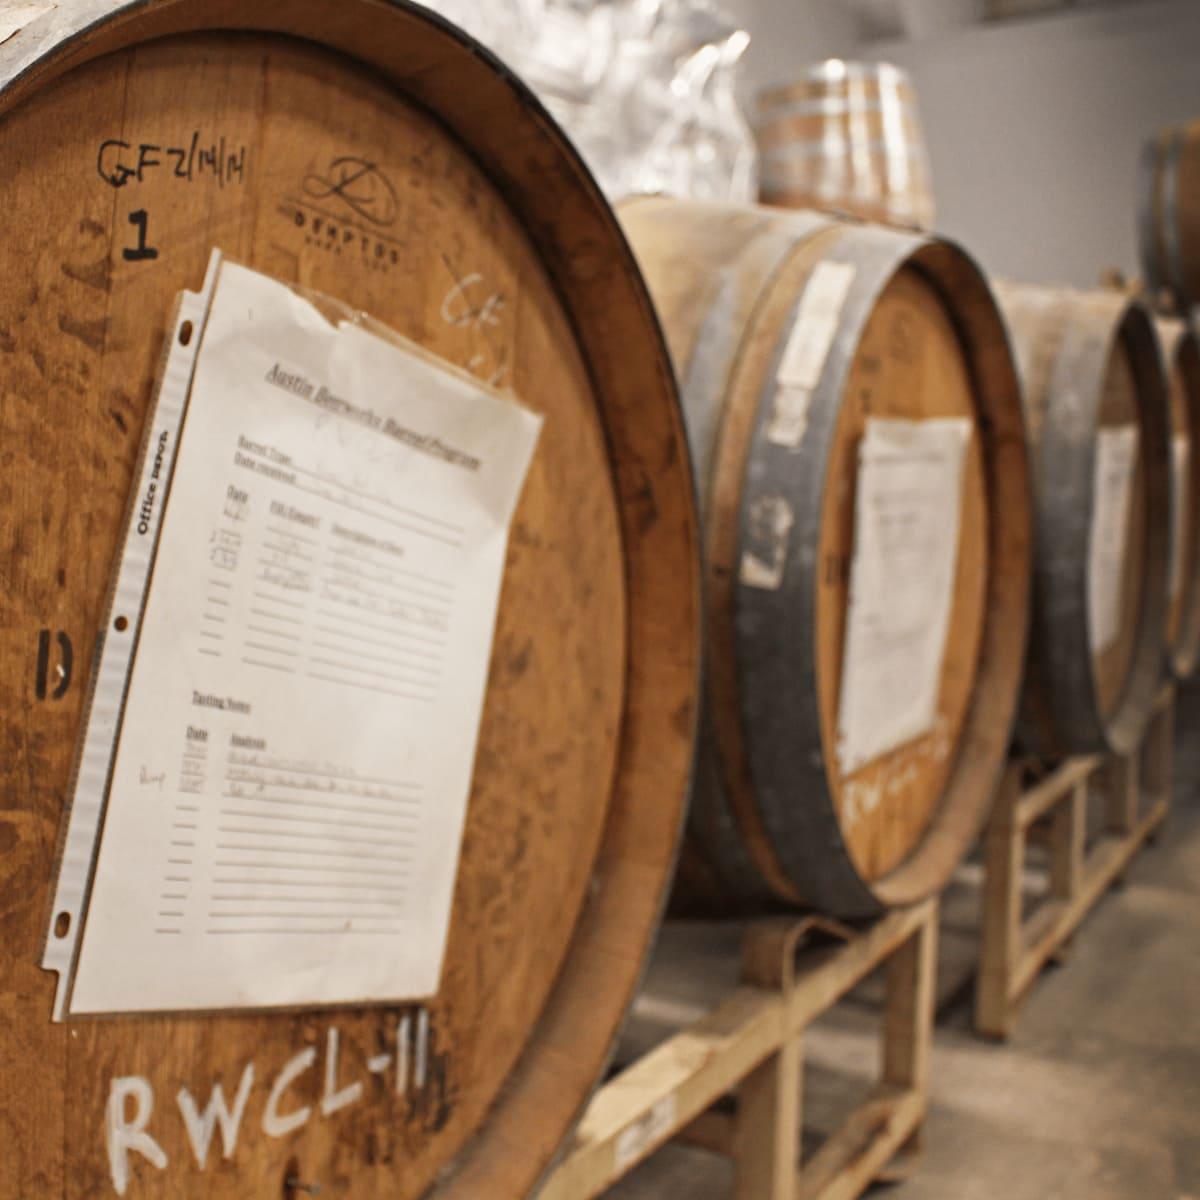 Austin Beerworks brewery barrels